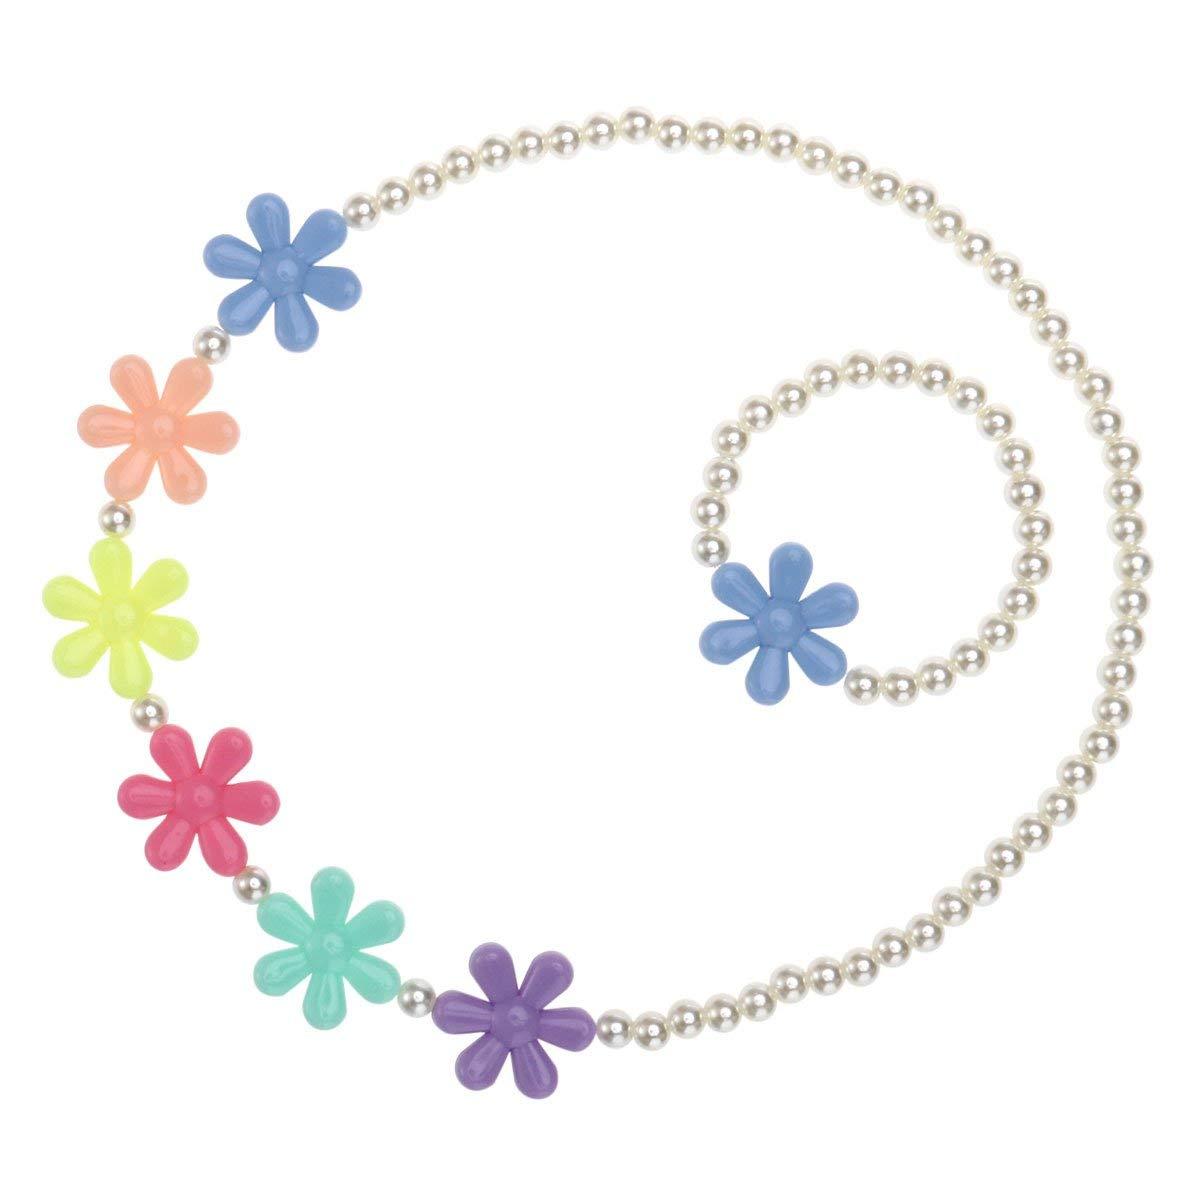 Tinksky Girls Beaded Necklace Bracelet Lovely Children Snowflake Beads Jewelry Set for Kids Jewelry - Christmas Birthday Gift for Children (Random Flower Color)